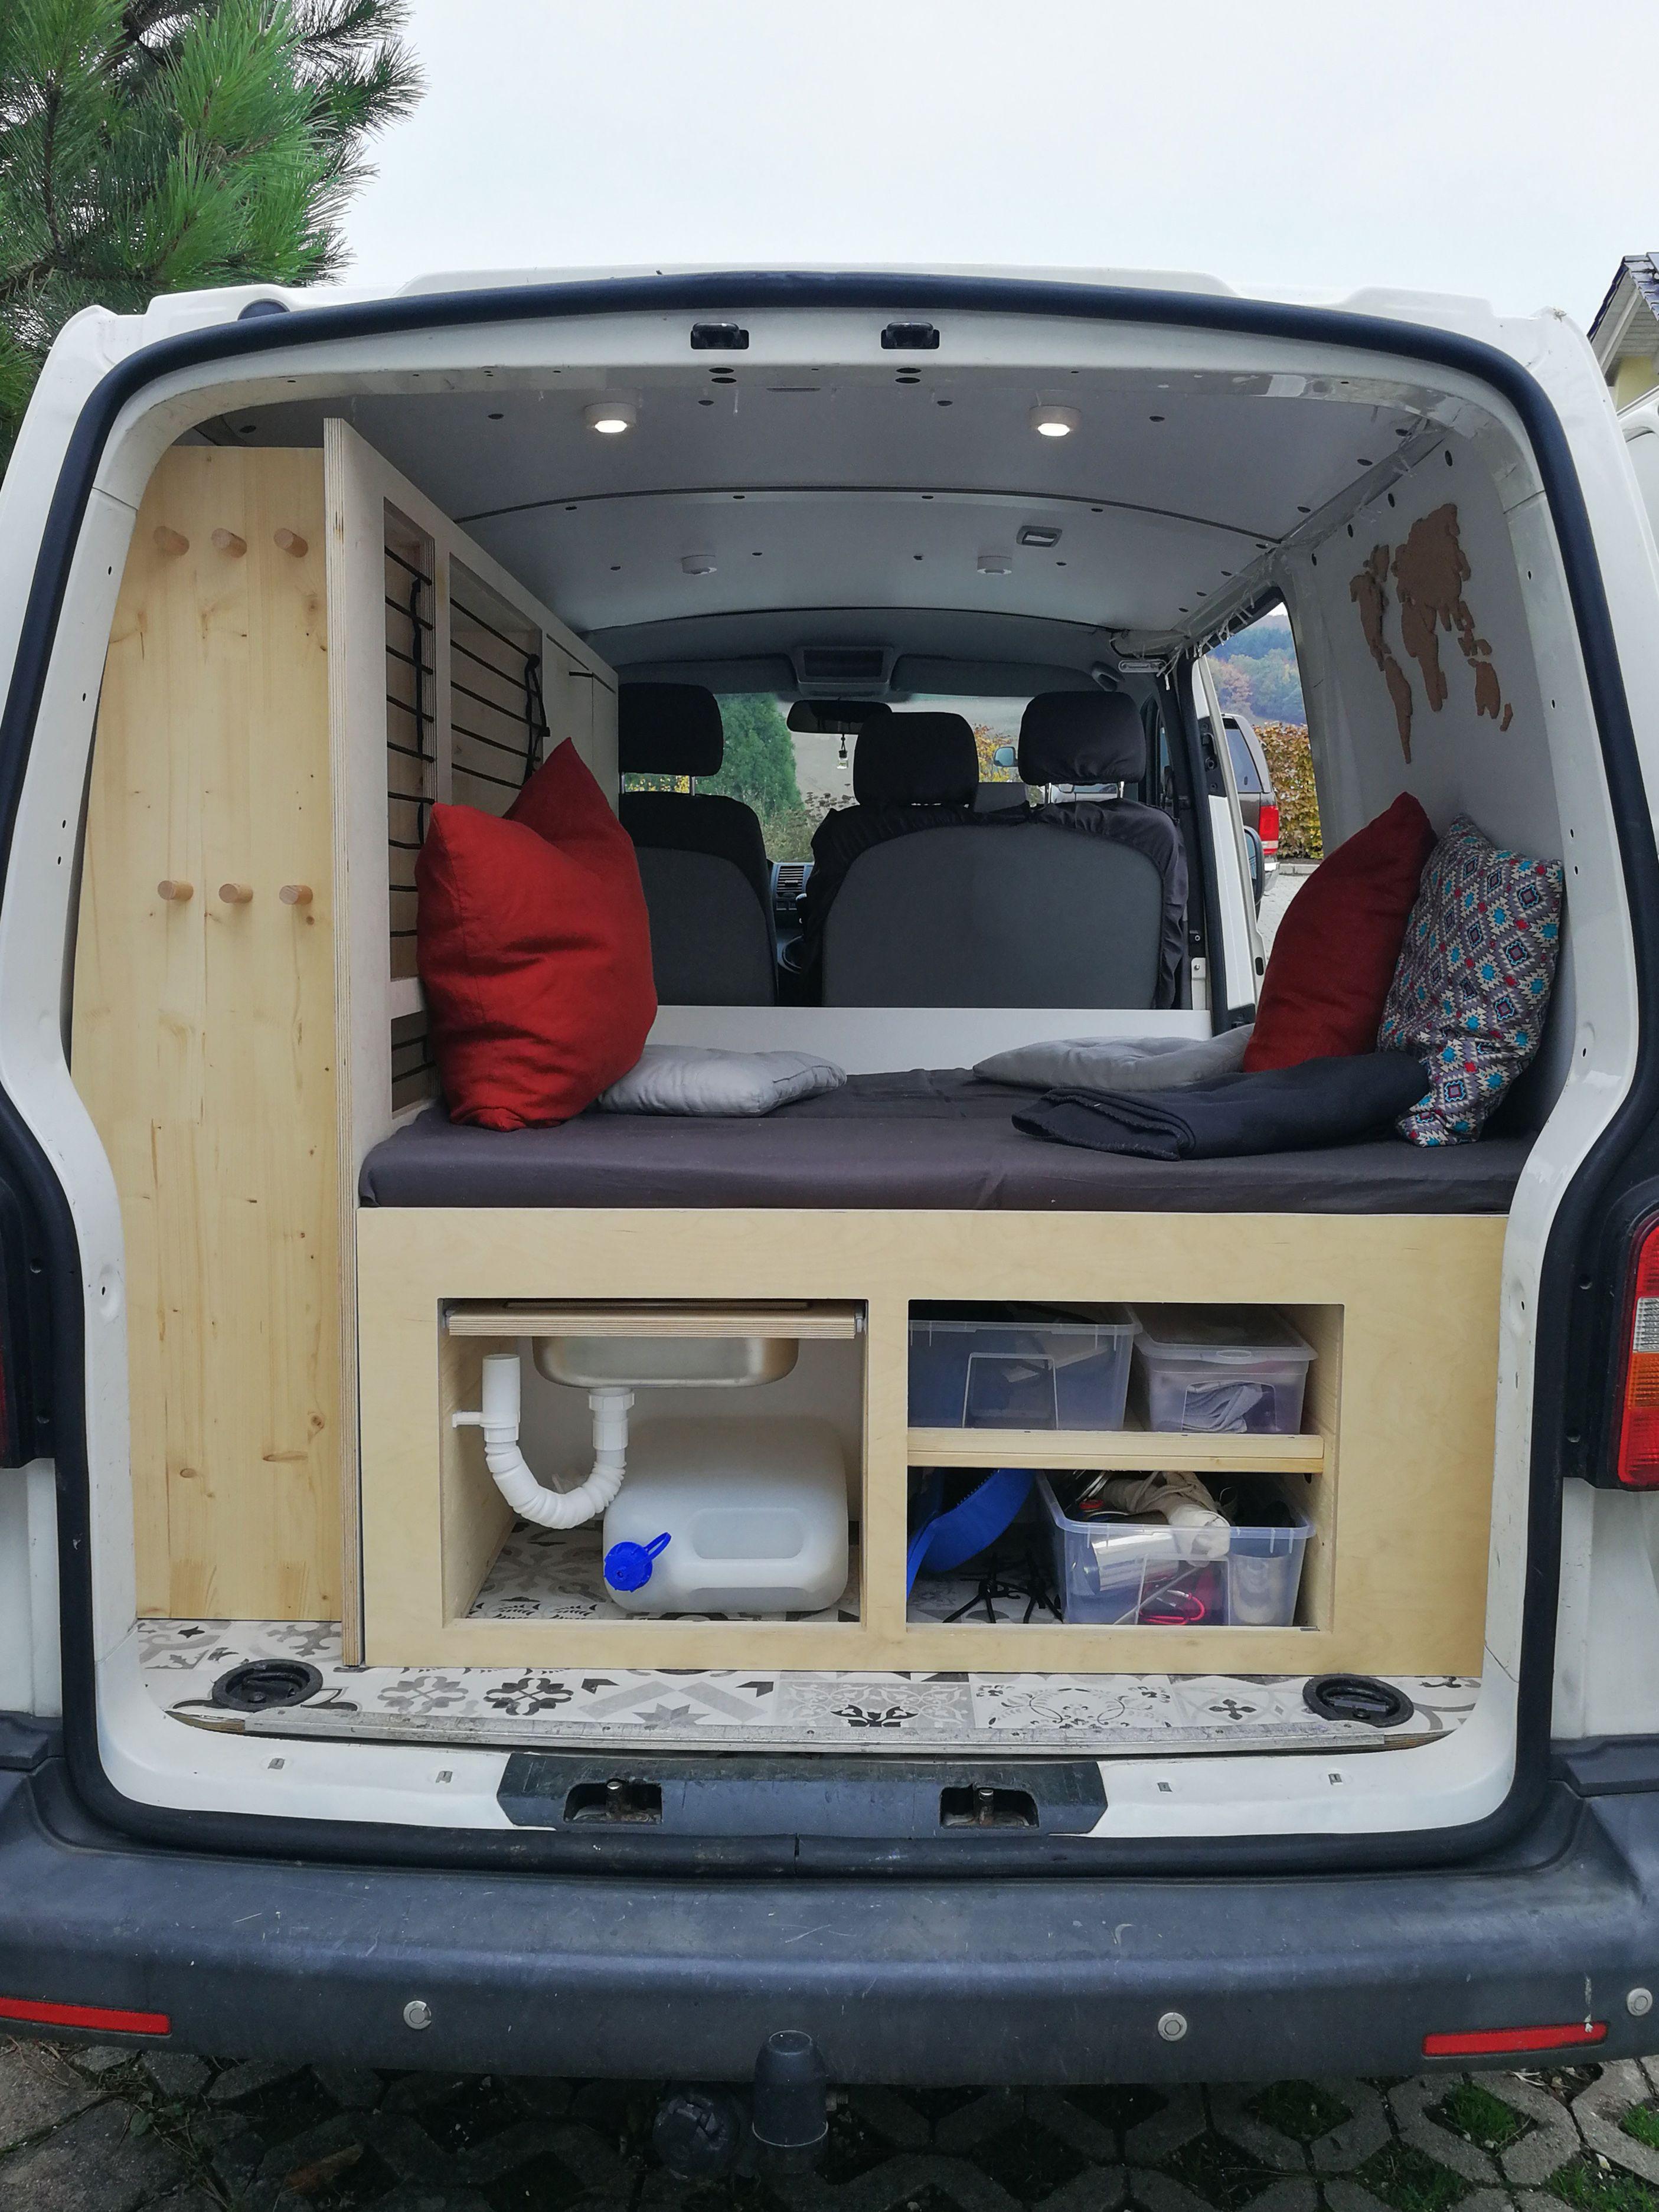 Vanlife Selfmade Camper Vw T5 Transporter Ausbau Vw T5 Wohnwagen Umgebaute Wohnmobile